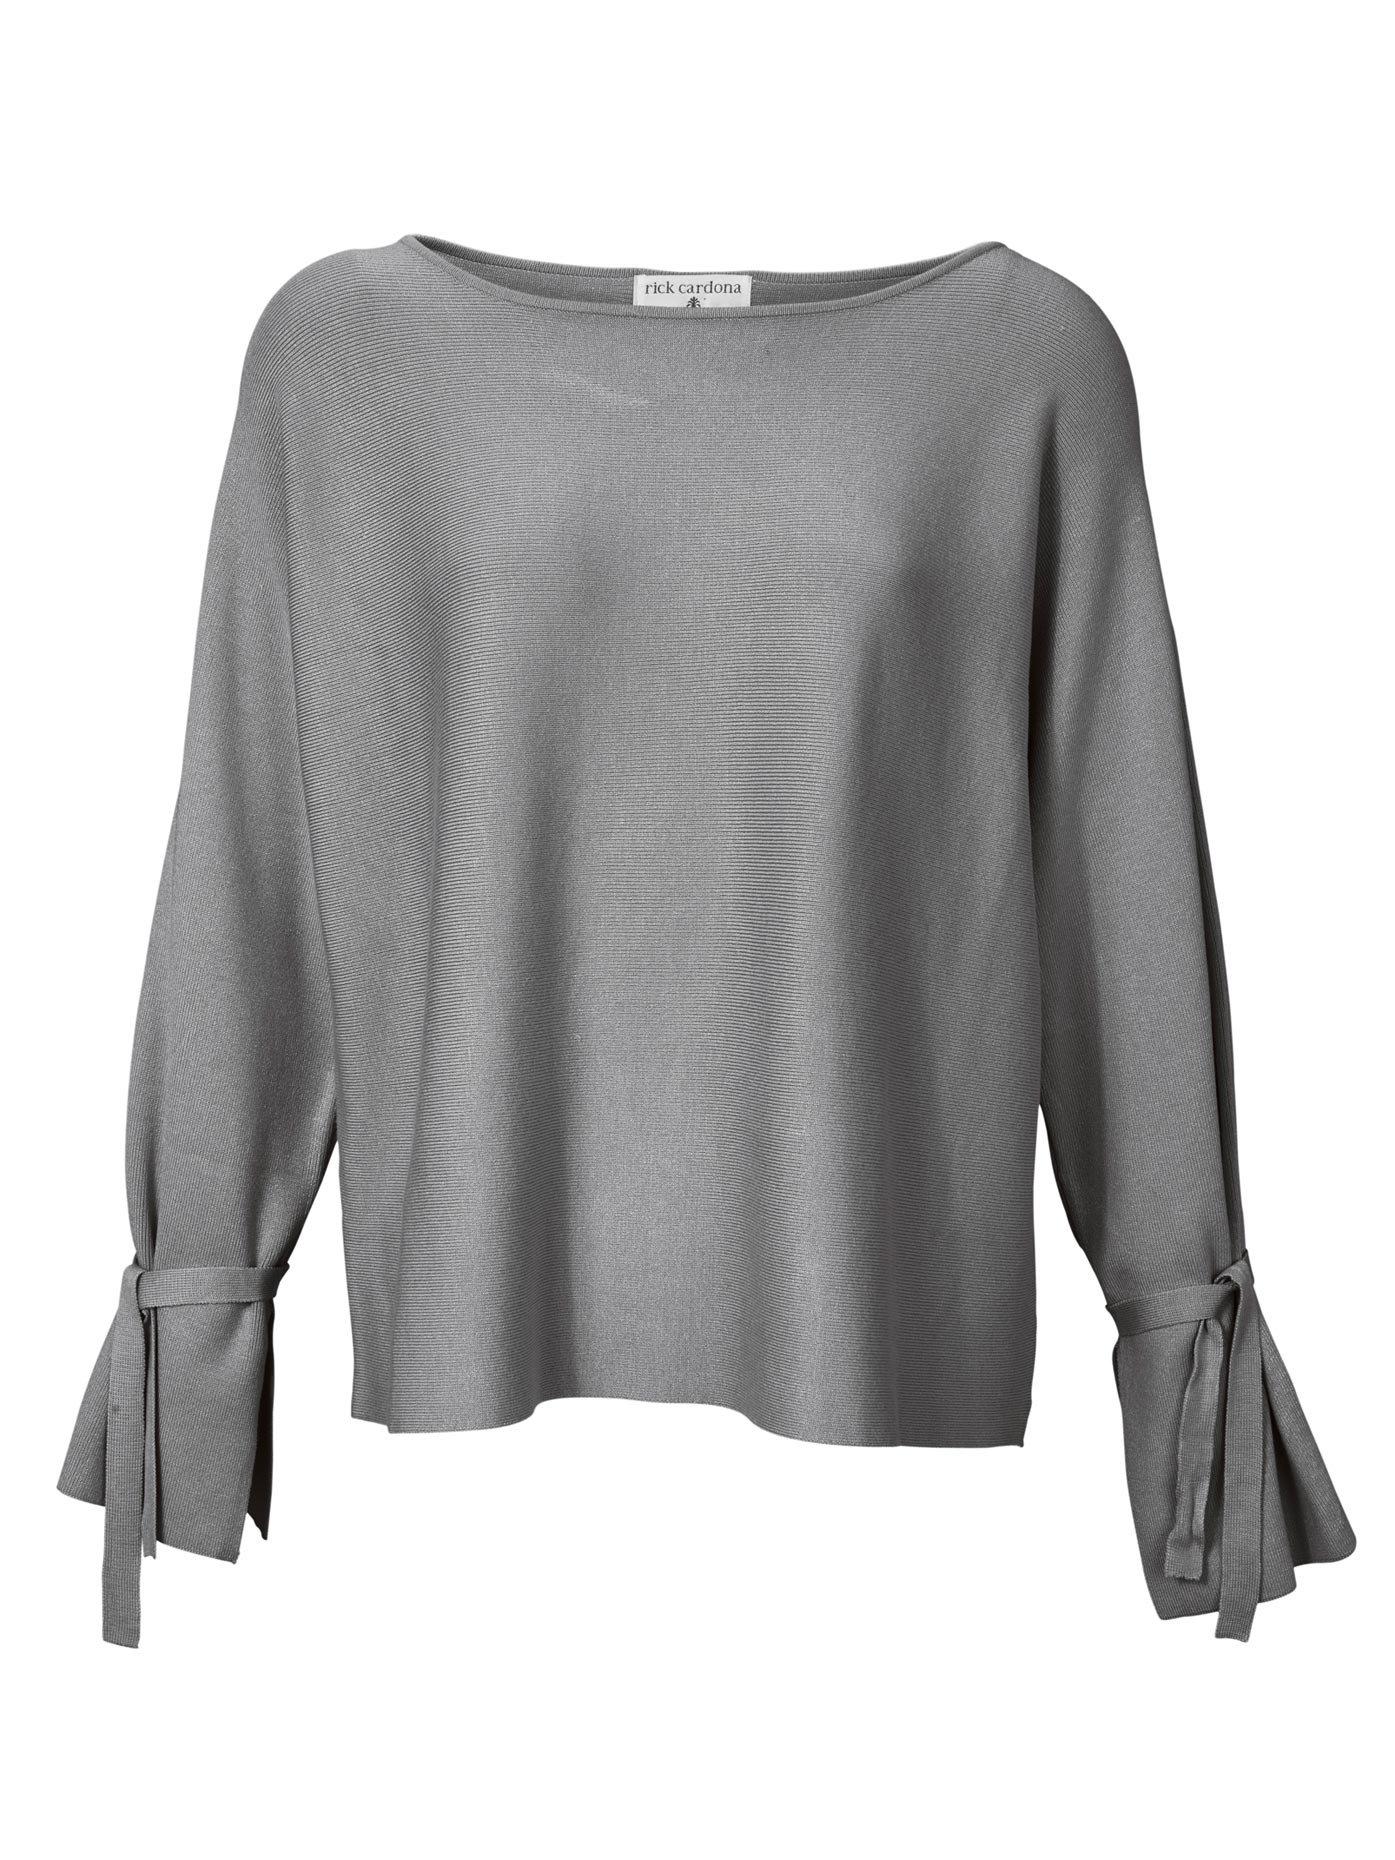 RICK CARDONA by Heine gebreide trui Oversized trui bij OTTO online kopen